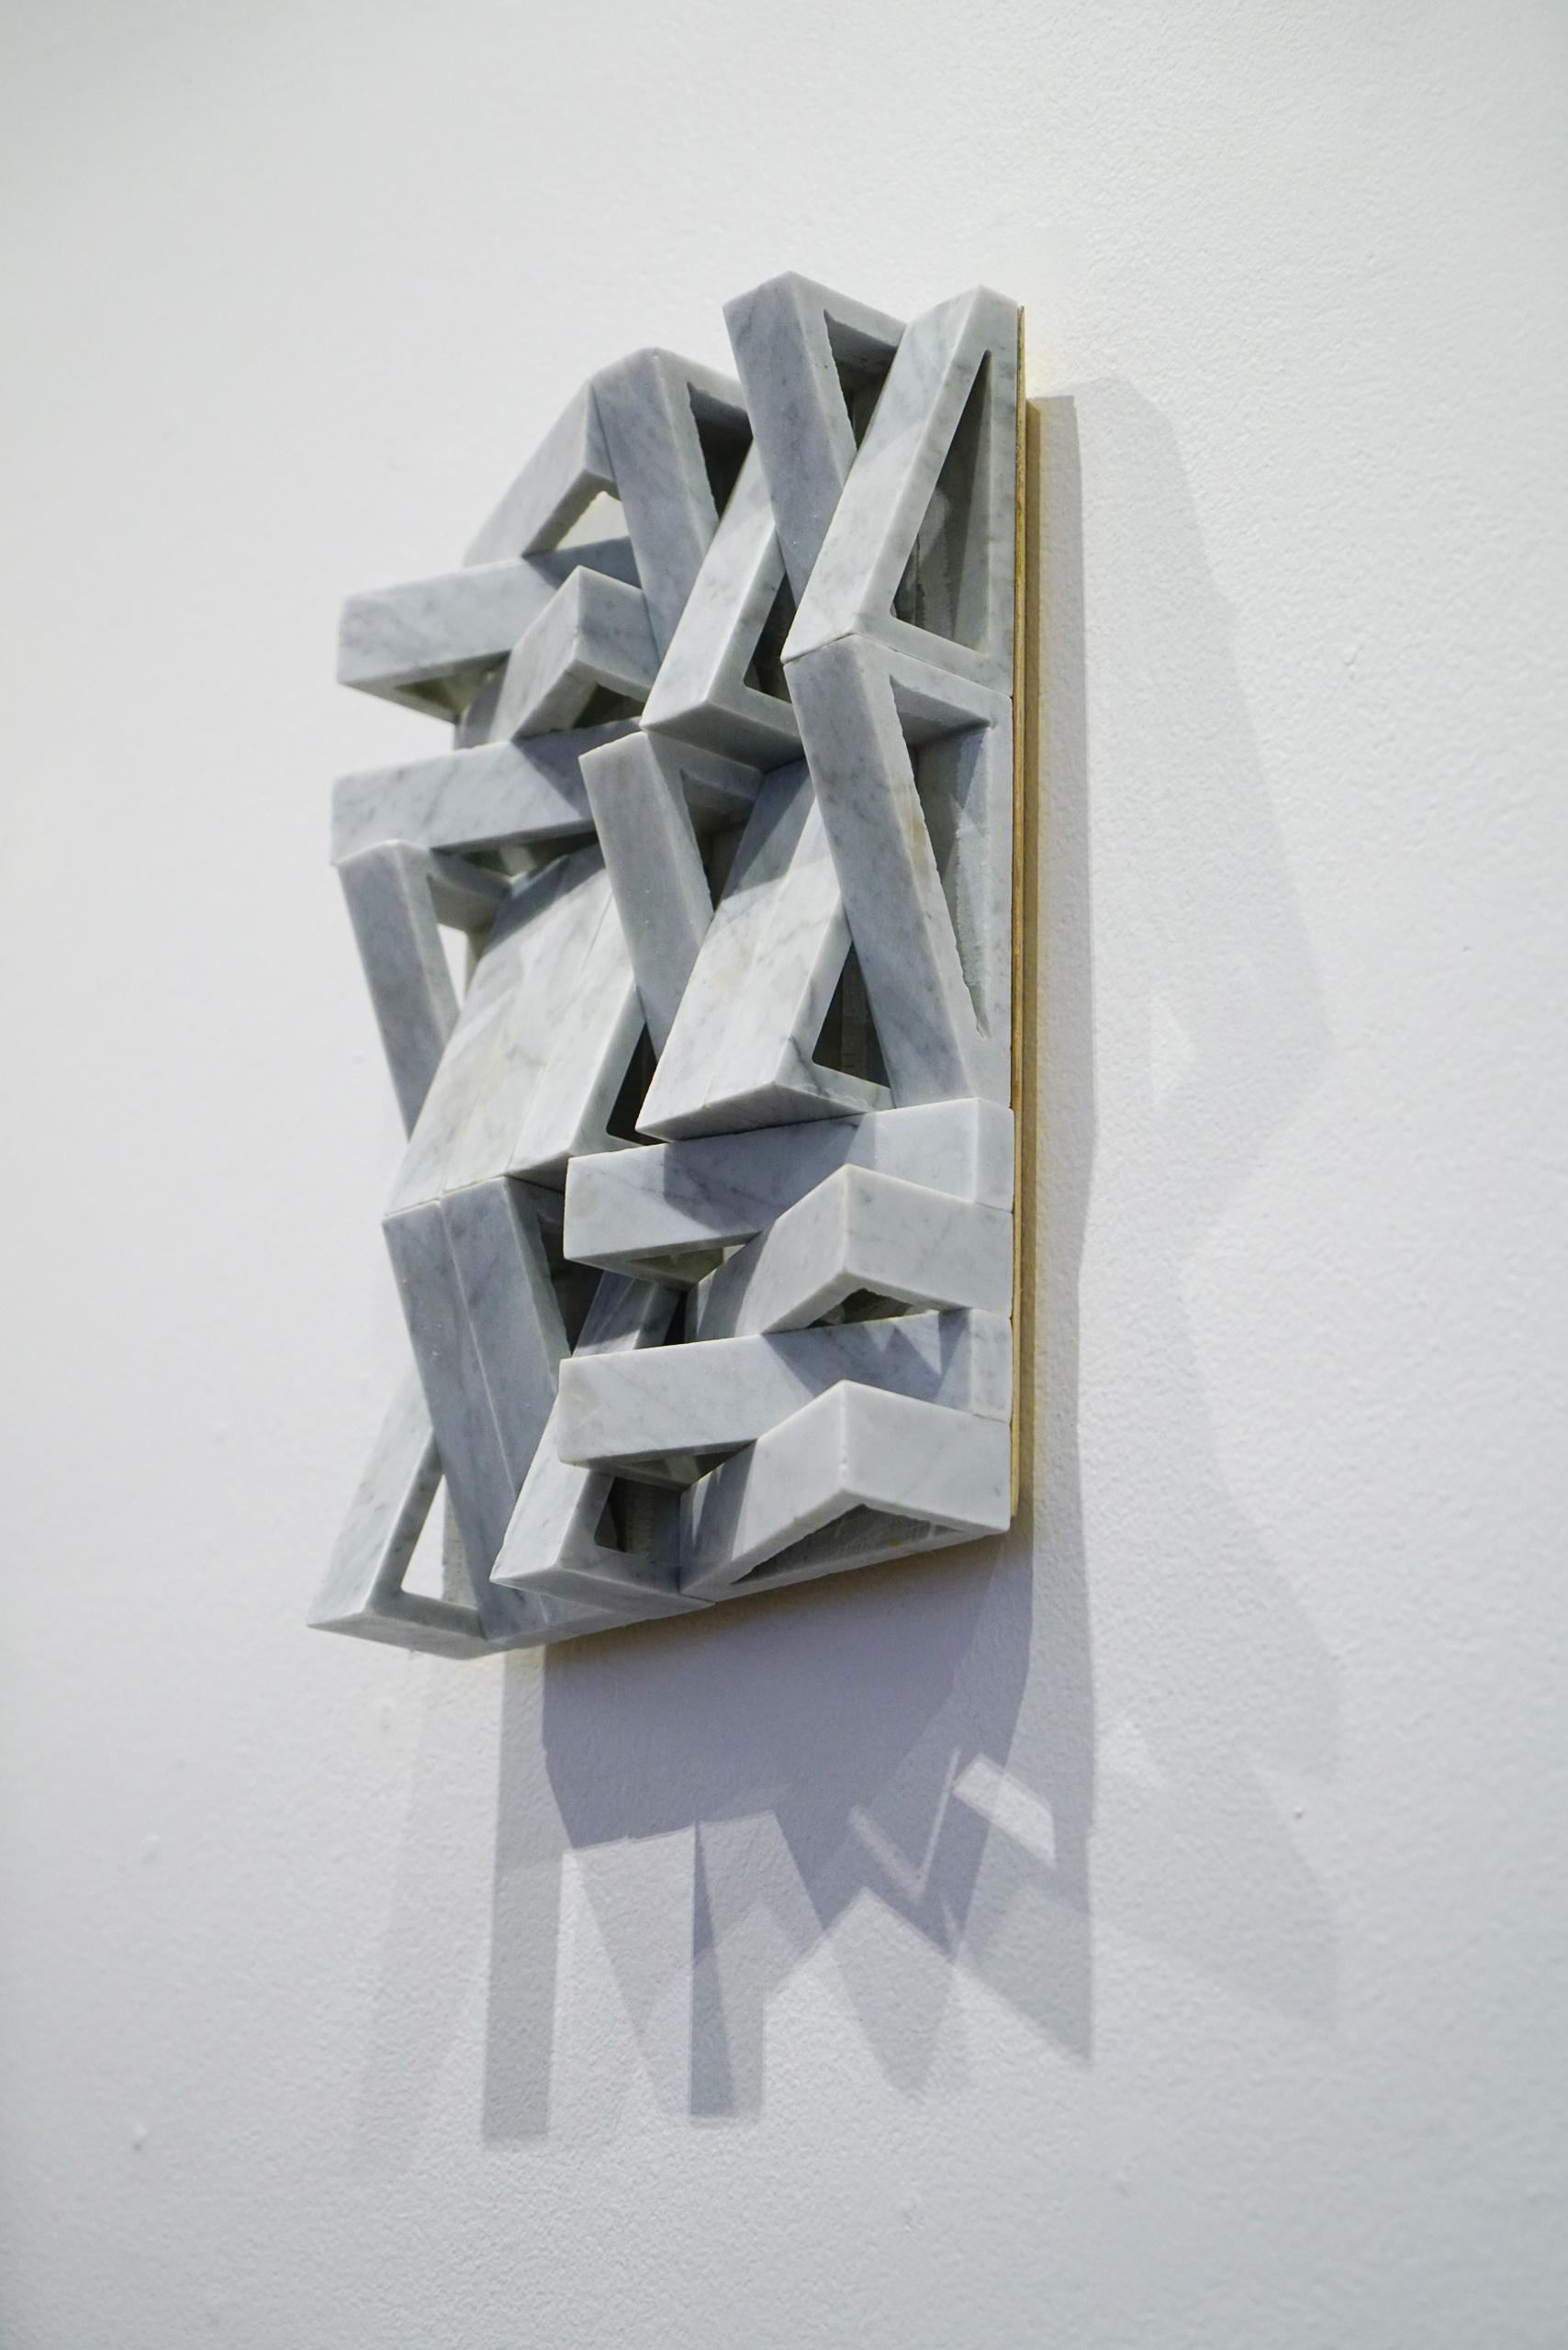 MRS3 1.1 2018 Carrar marble & plywood 36cm x 24cm x 8cm